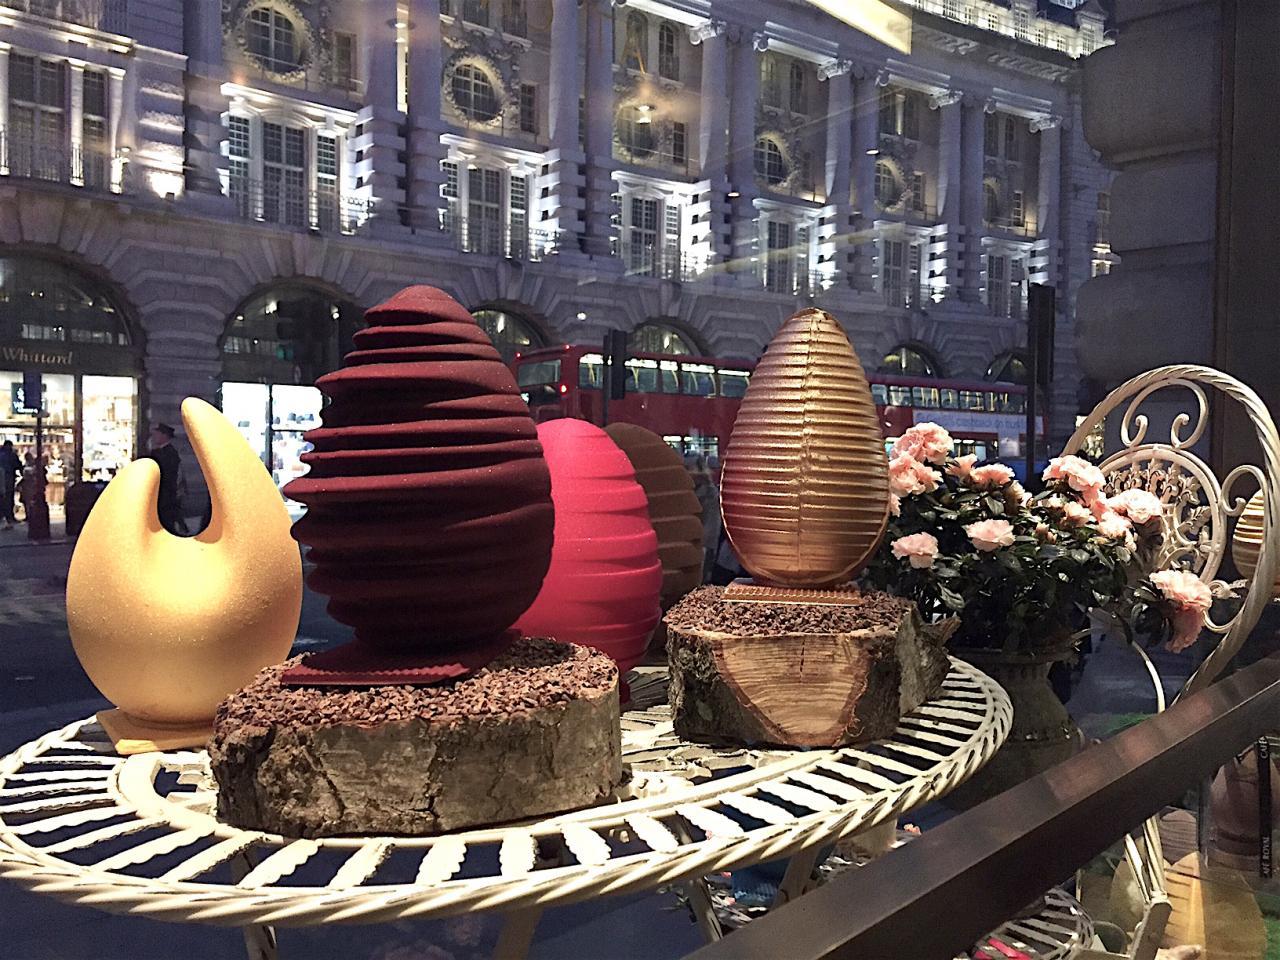 The edible chocolate display at Café Royal